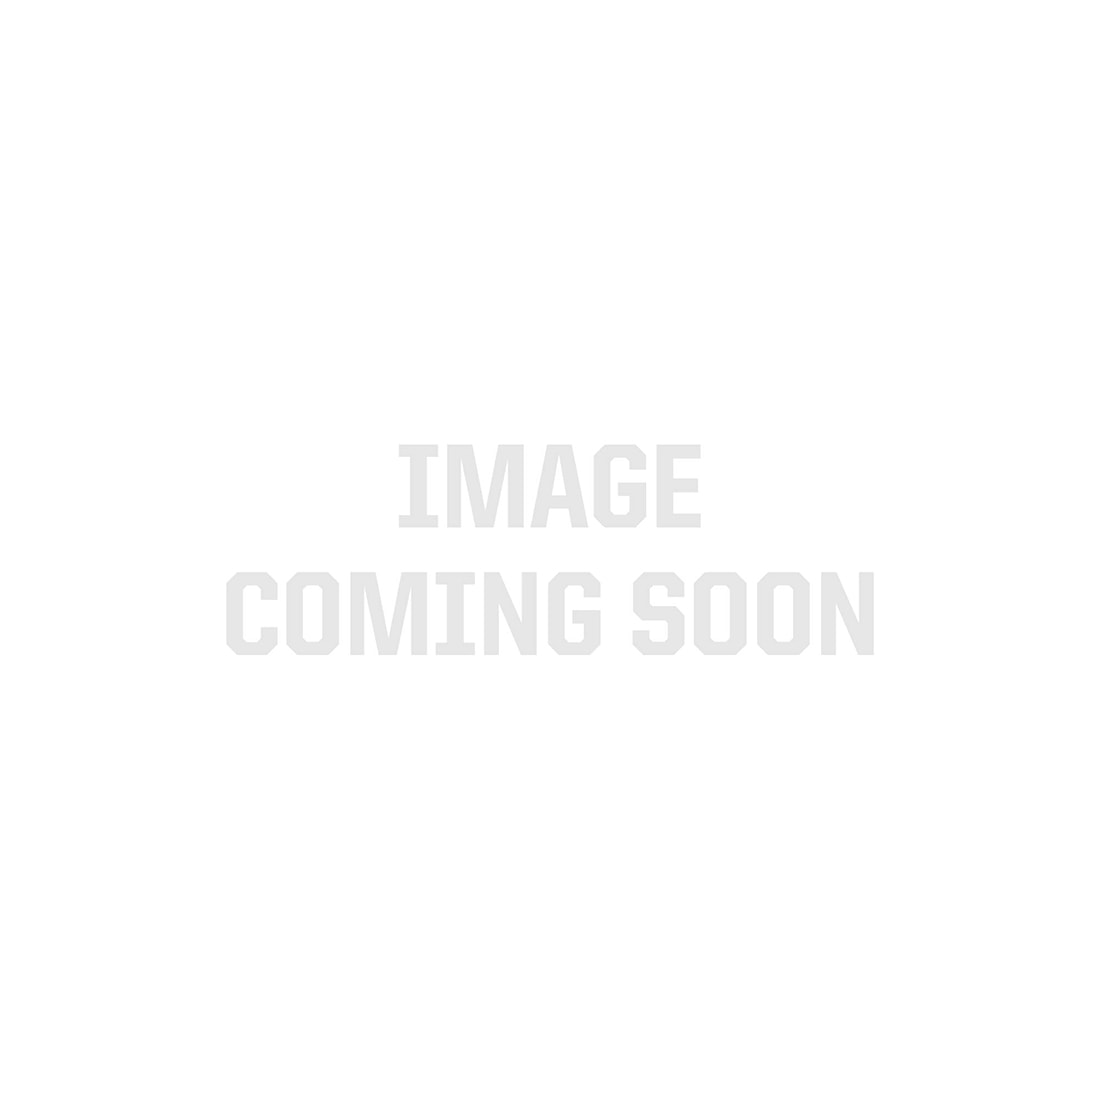 Waterproof Red 3528 Quad Row LED Strip Light, 450/m, 28mm wide, Sample Kit